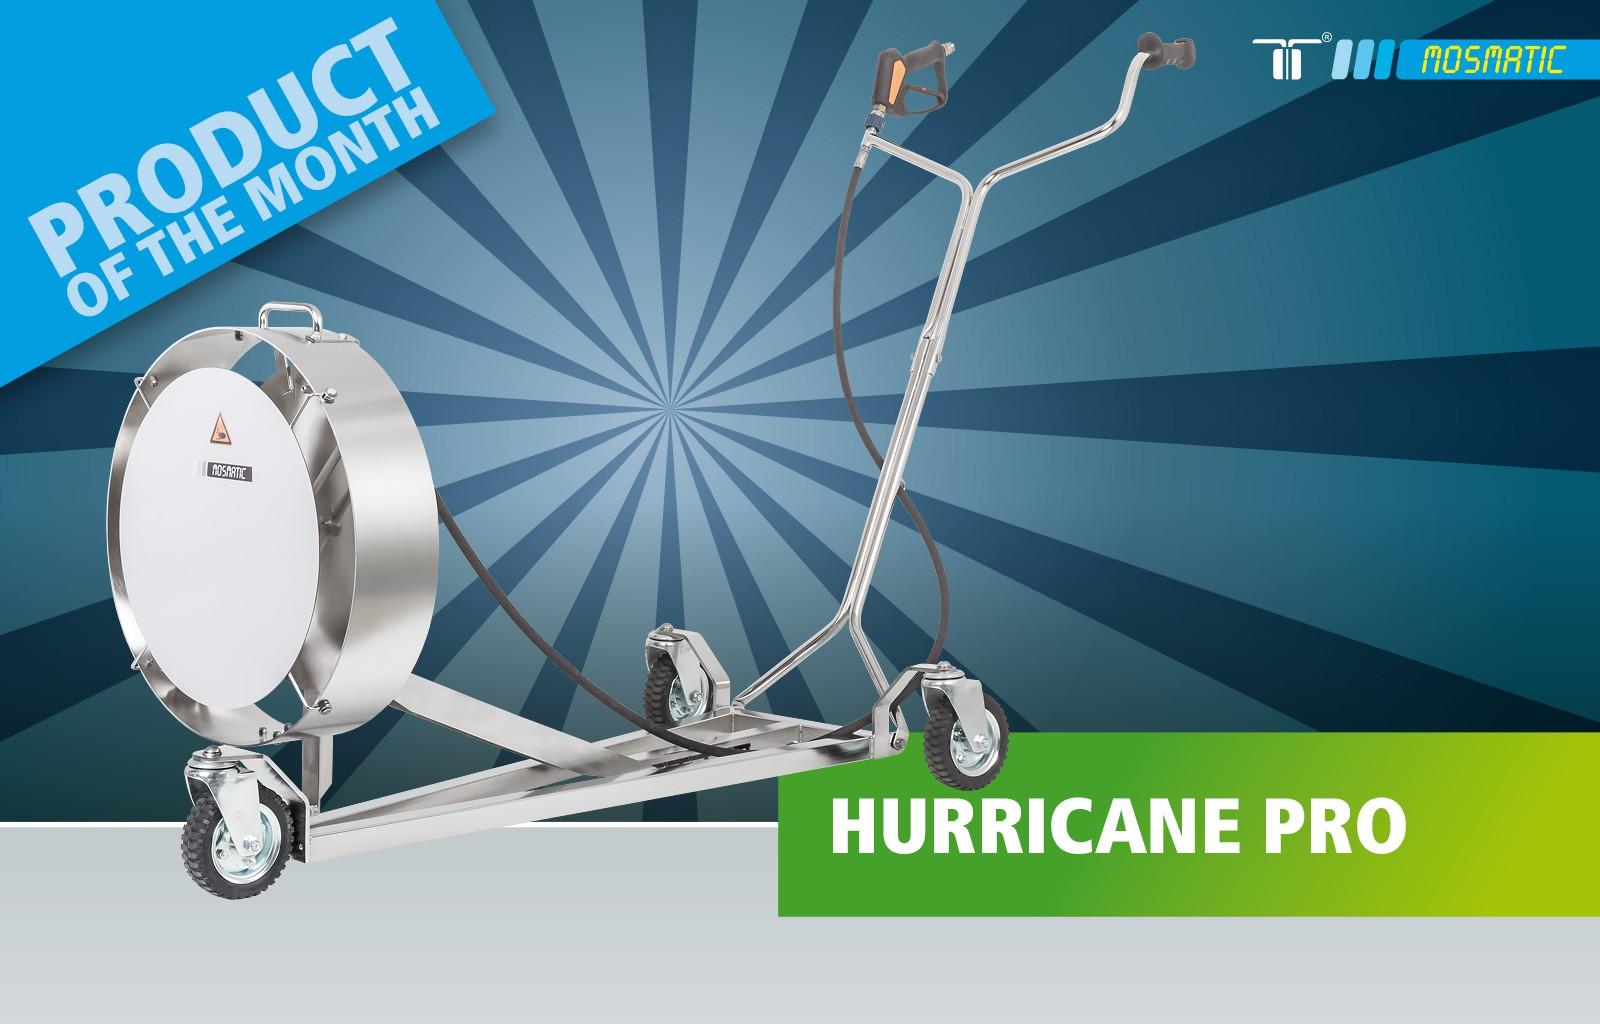 Mosmatic Hurricance Pro